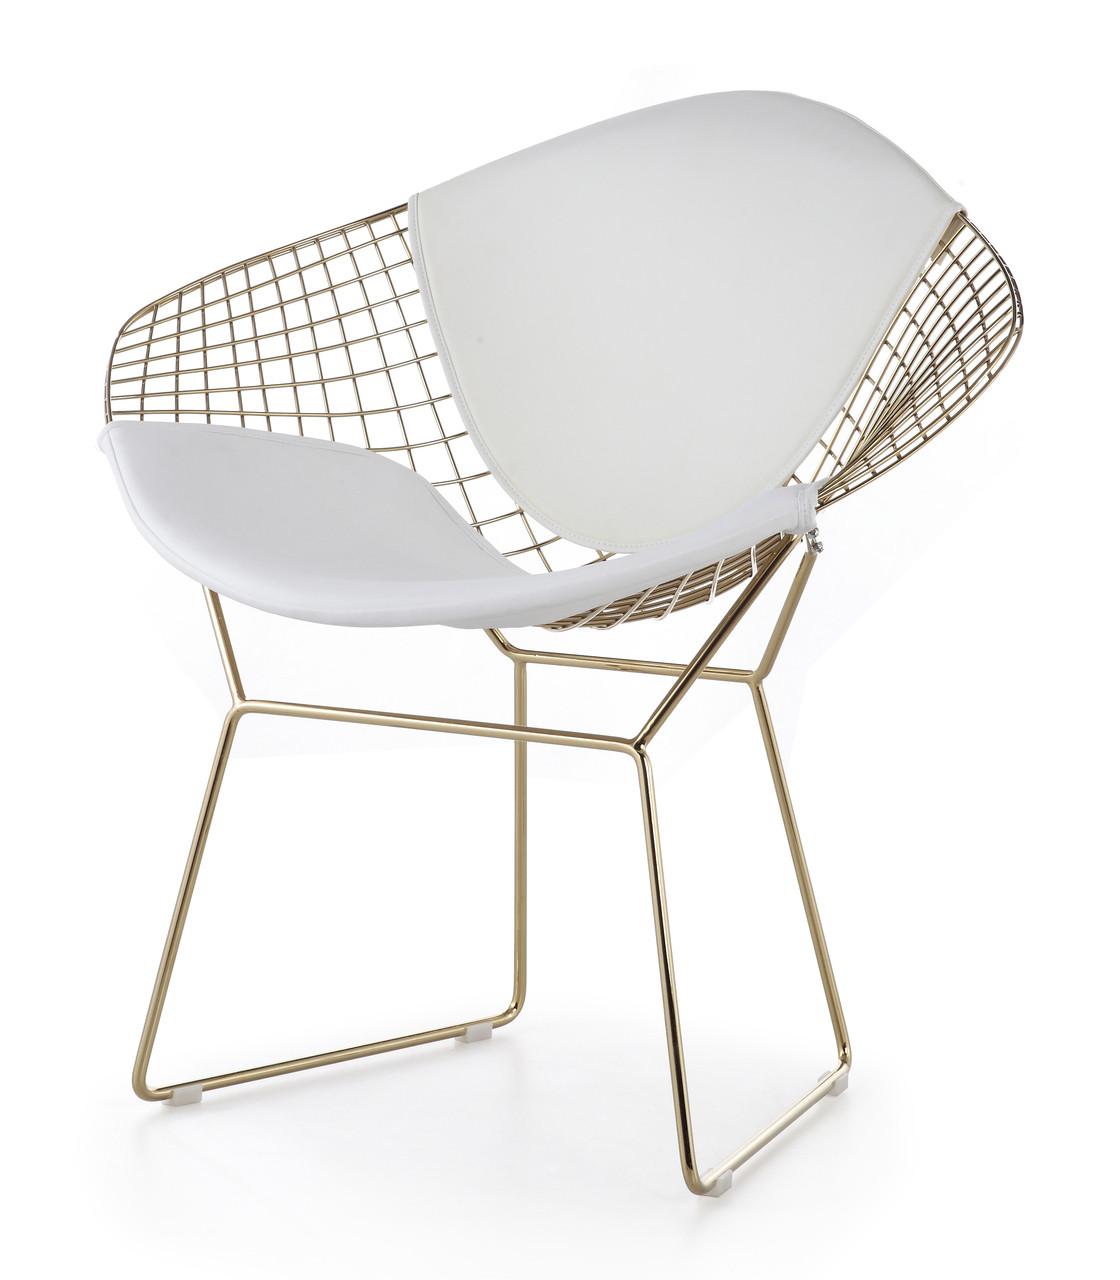 diamond chair replica wheelchair buy bertoia in gold